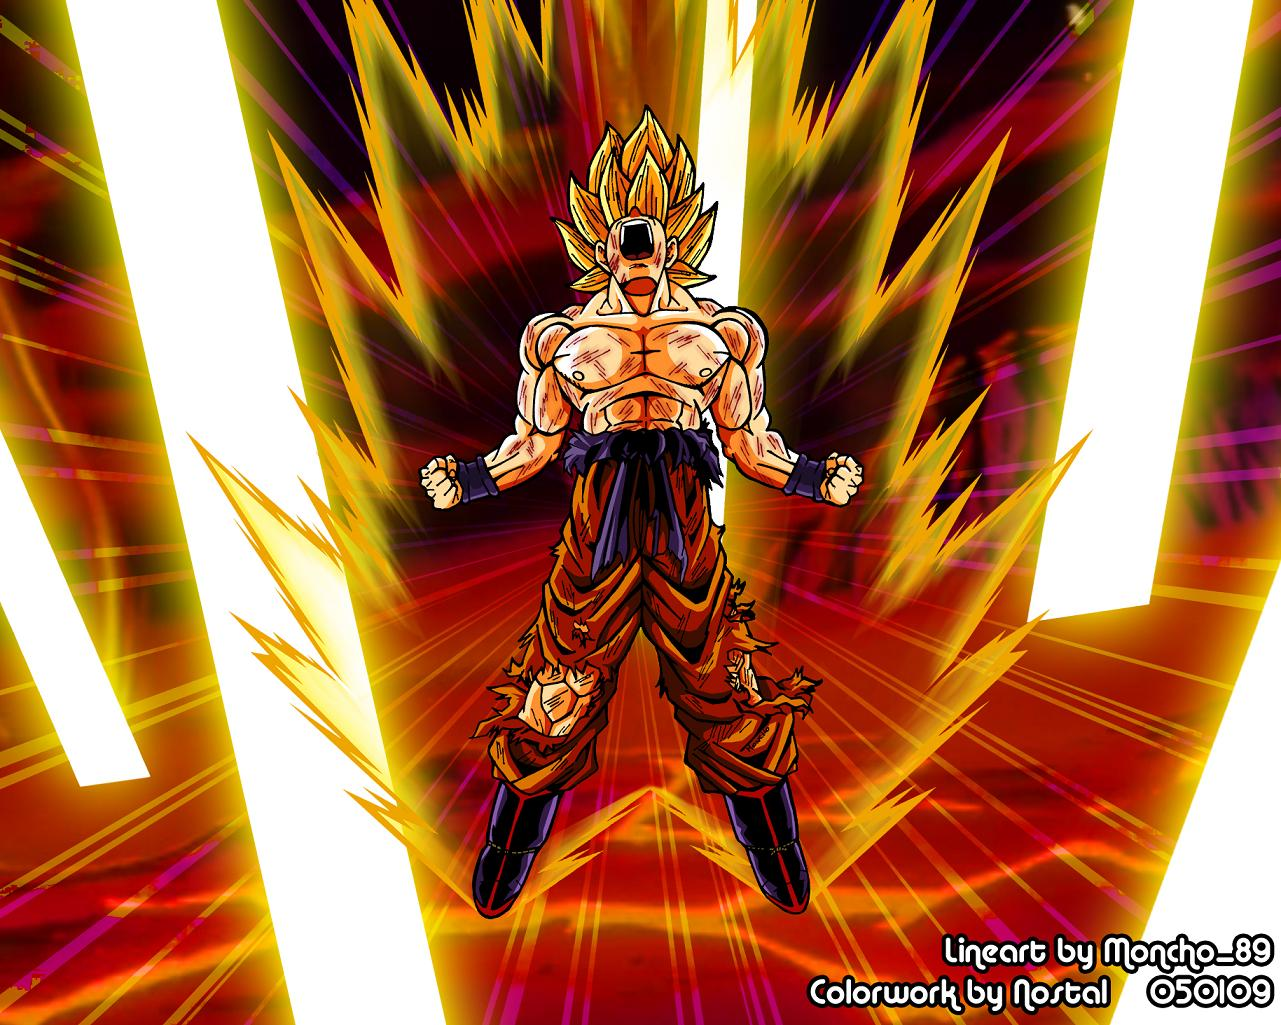 Goku_super_saiyajin_ft_nostal_by_moncho_